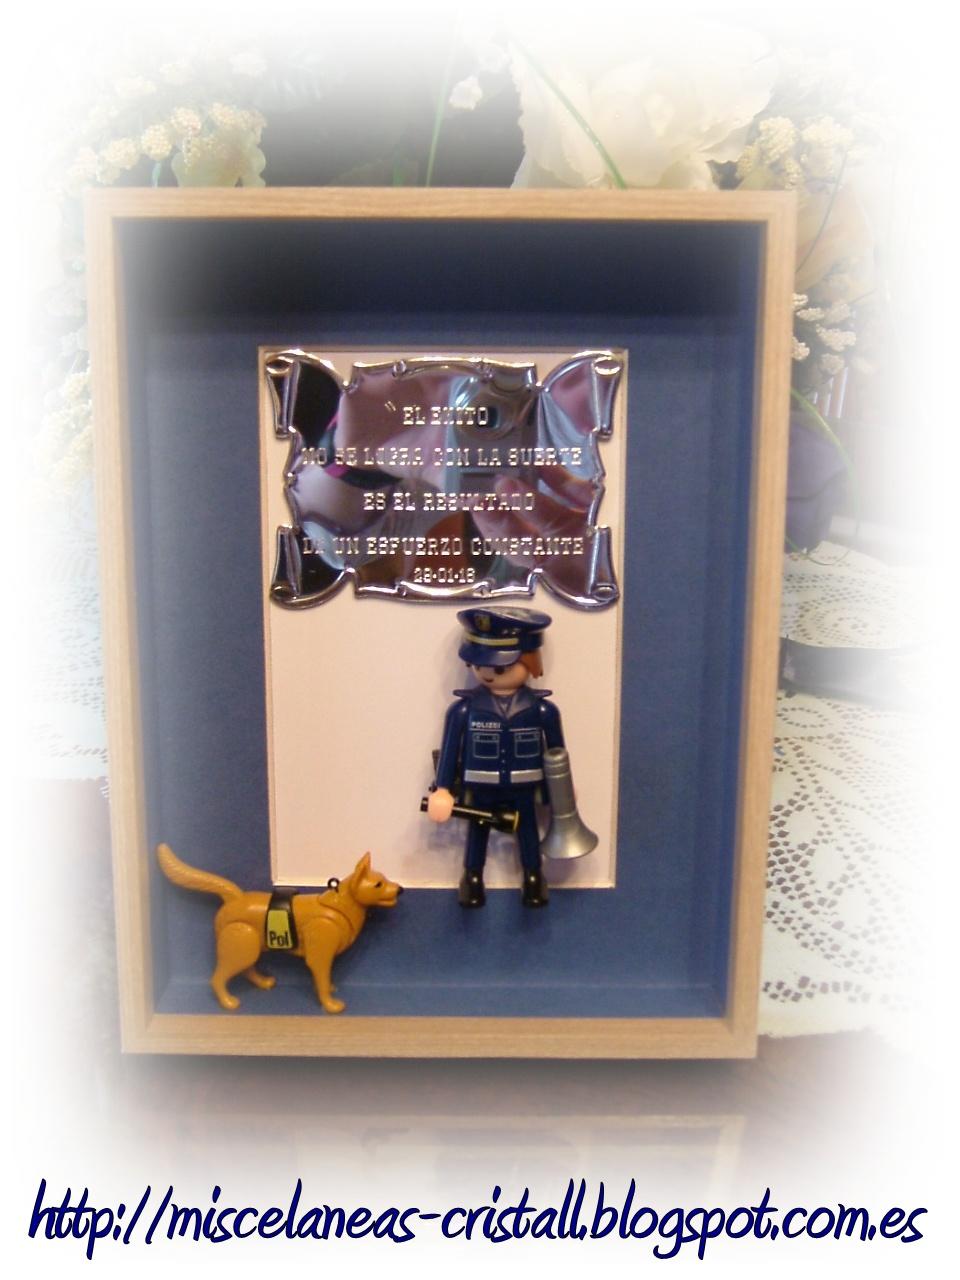 Misceláneas cristall: ***Un regalo original para un Policía***